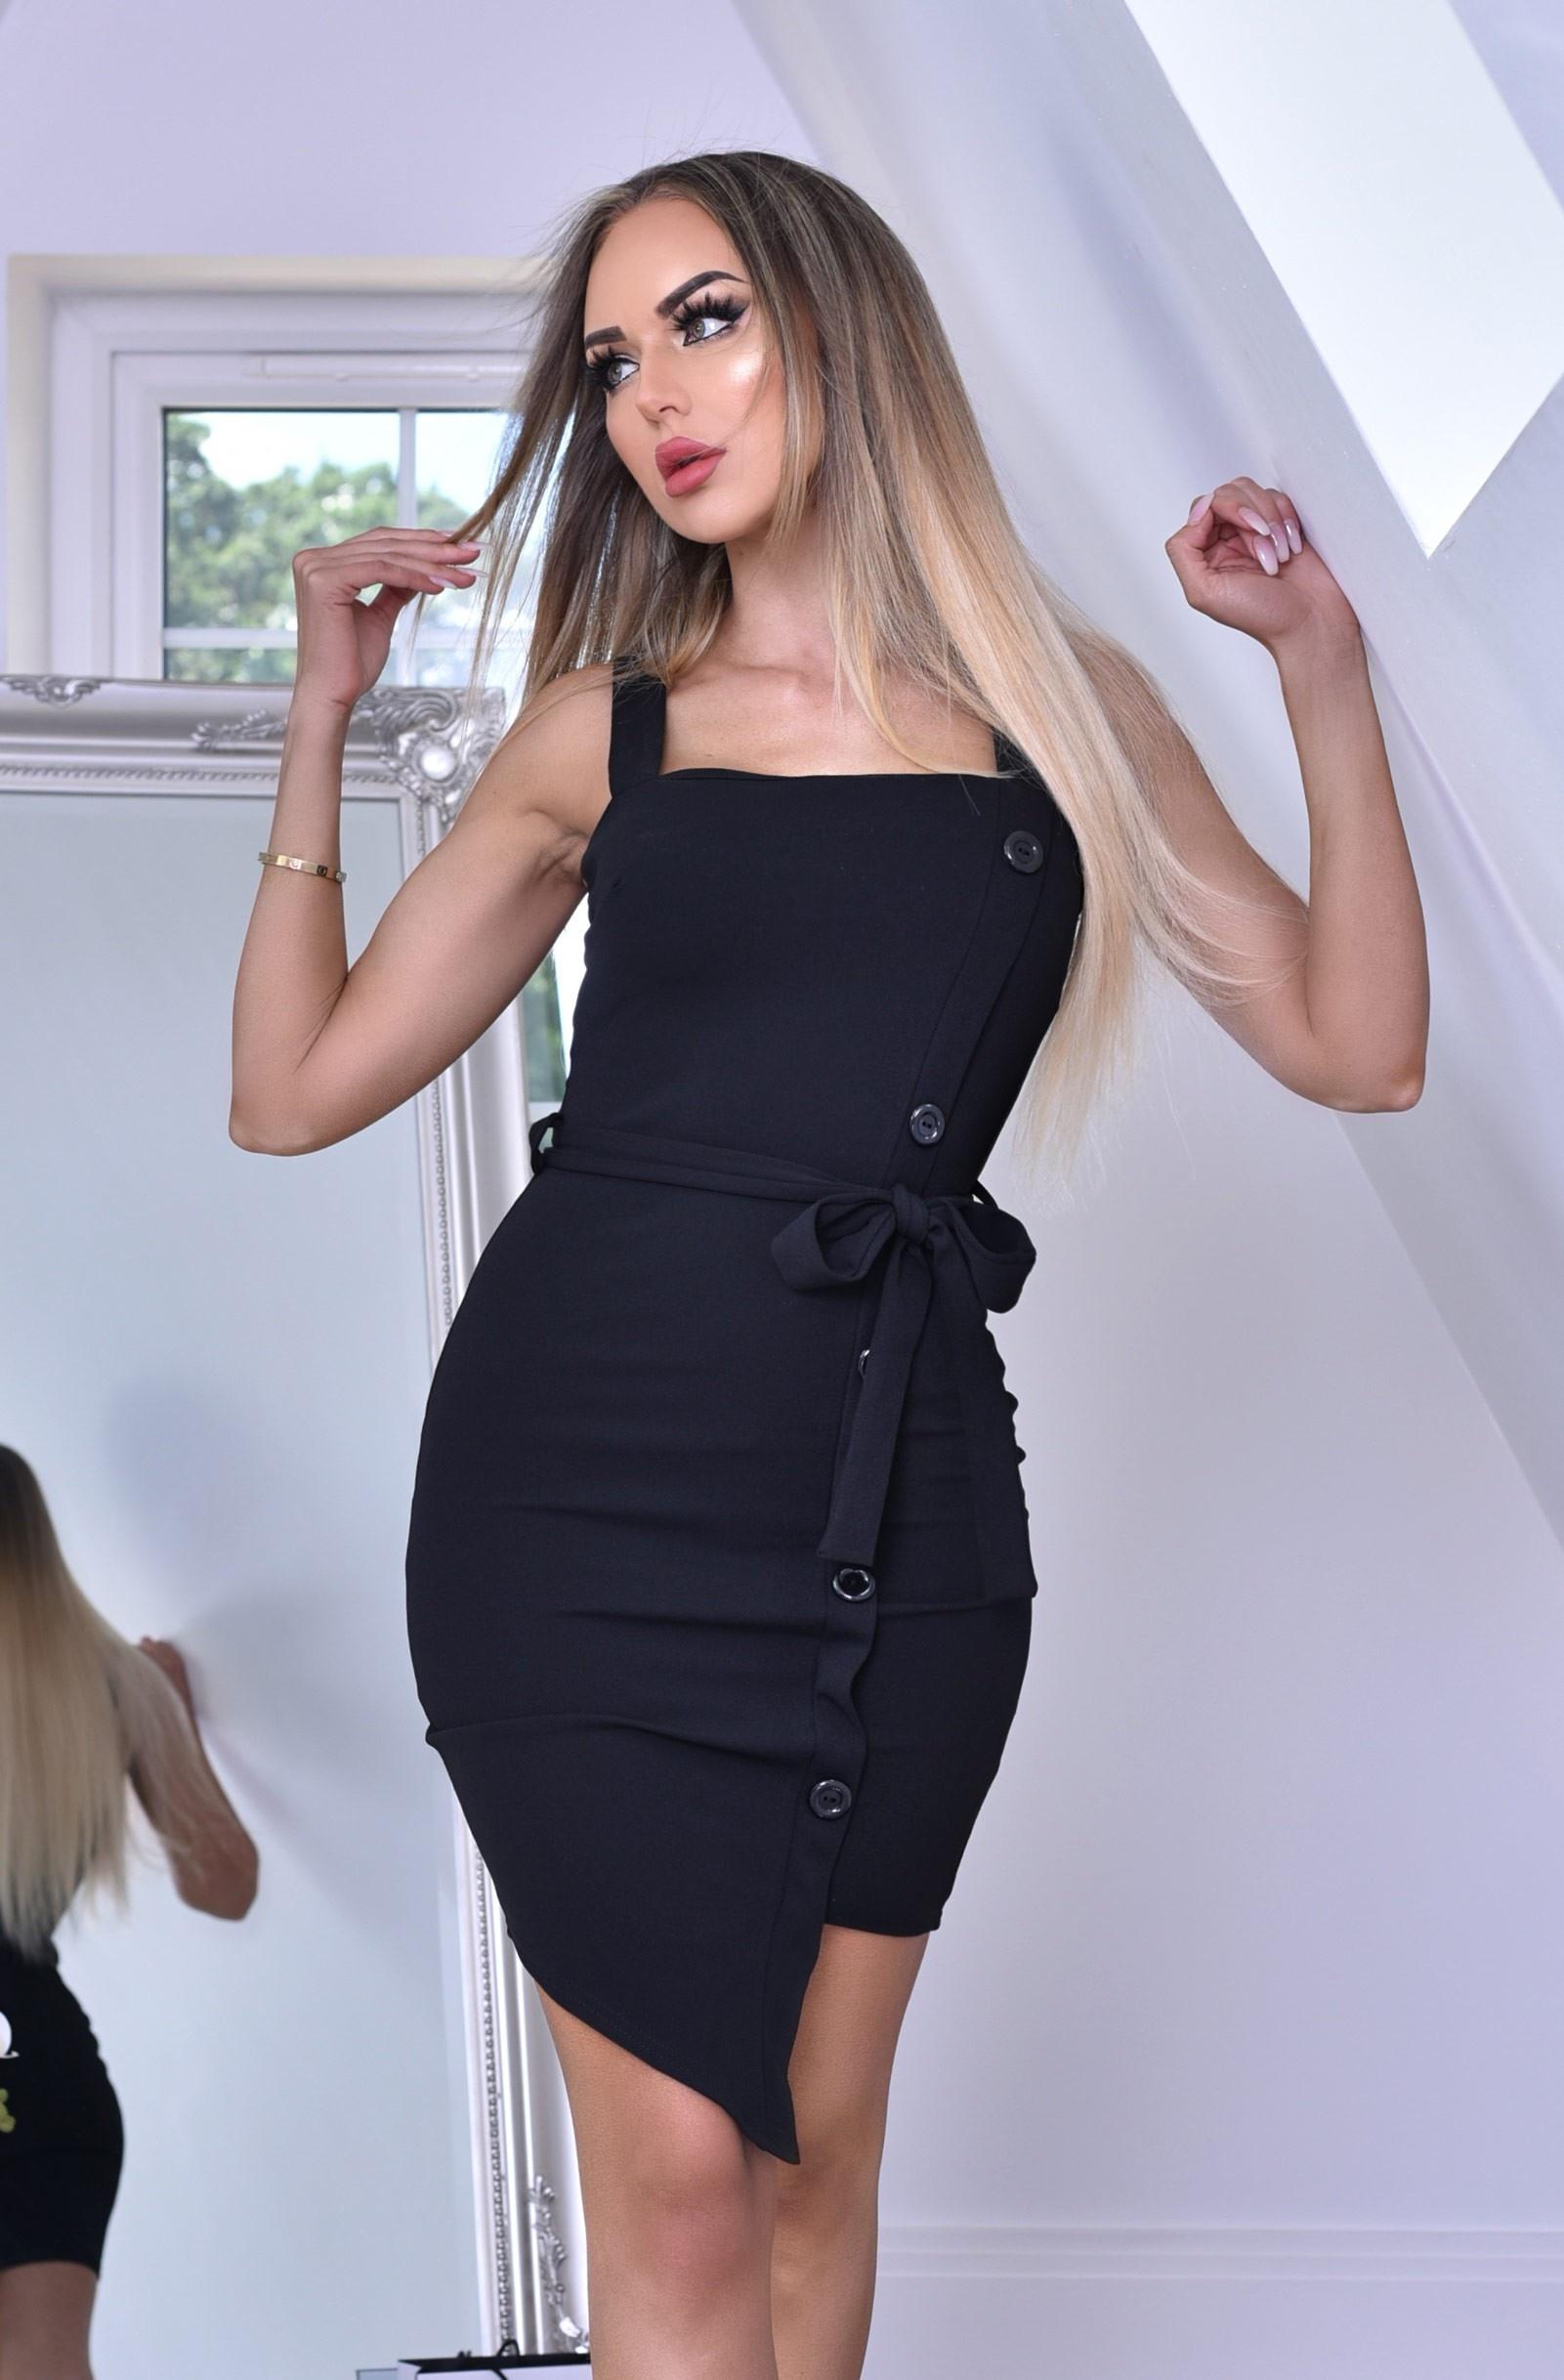 Sophia jurk met knoppen detail en riem zwart